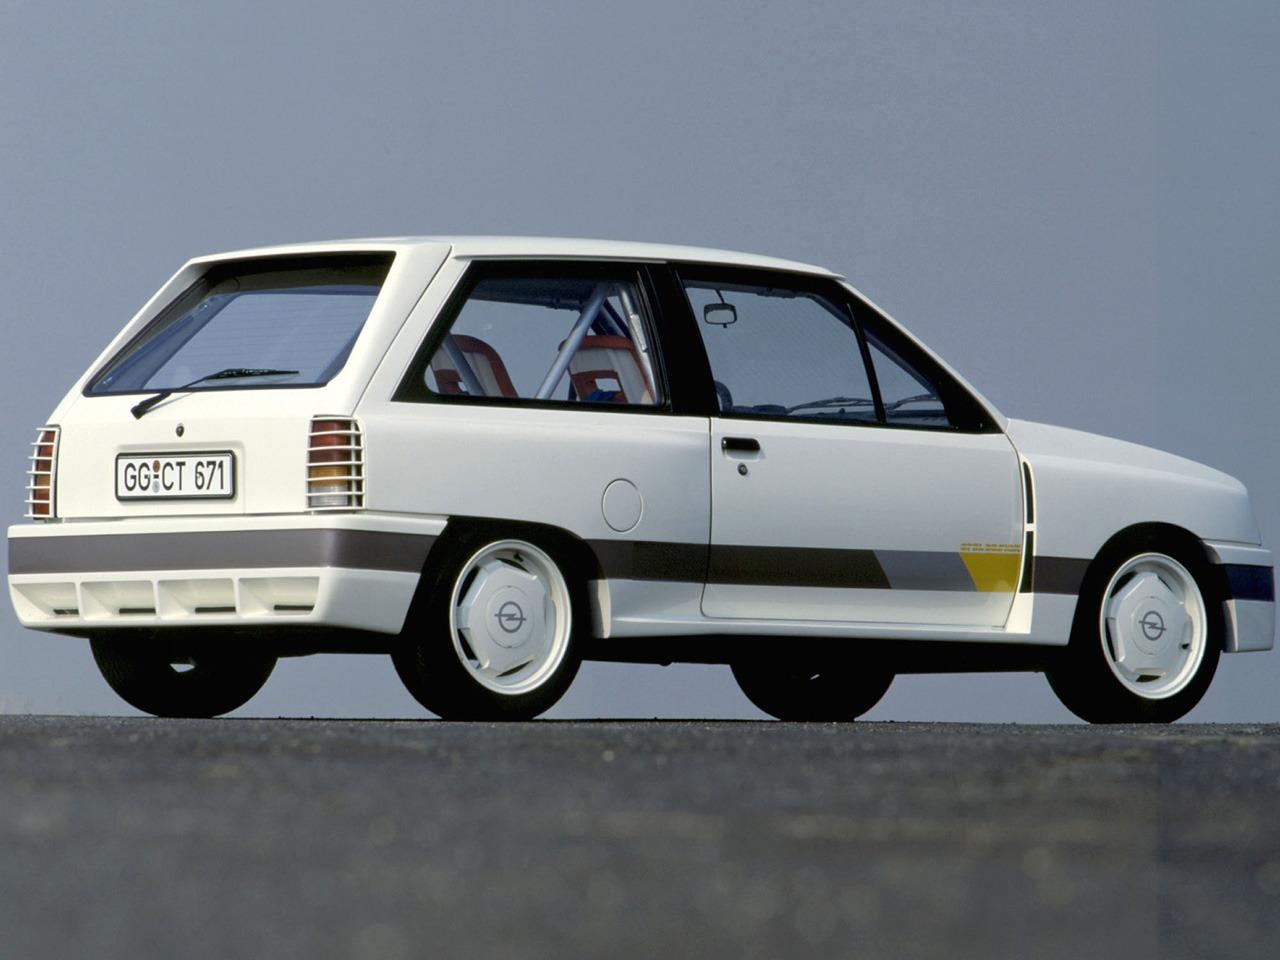 opel corsa sprint gr b prototype 1983 old concept cars. Black Bedroom Furniture Sets. Home Design Ideas